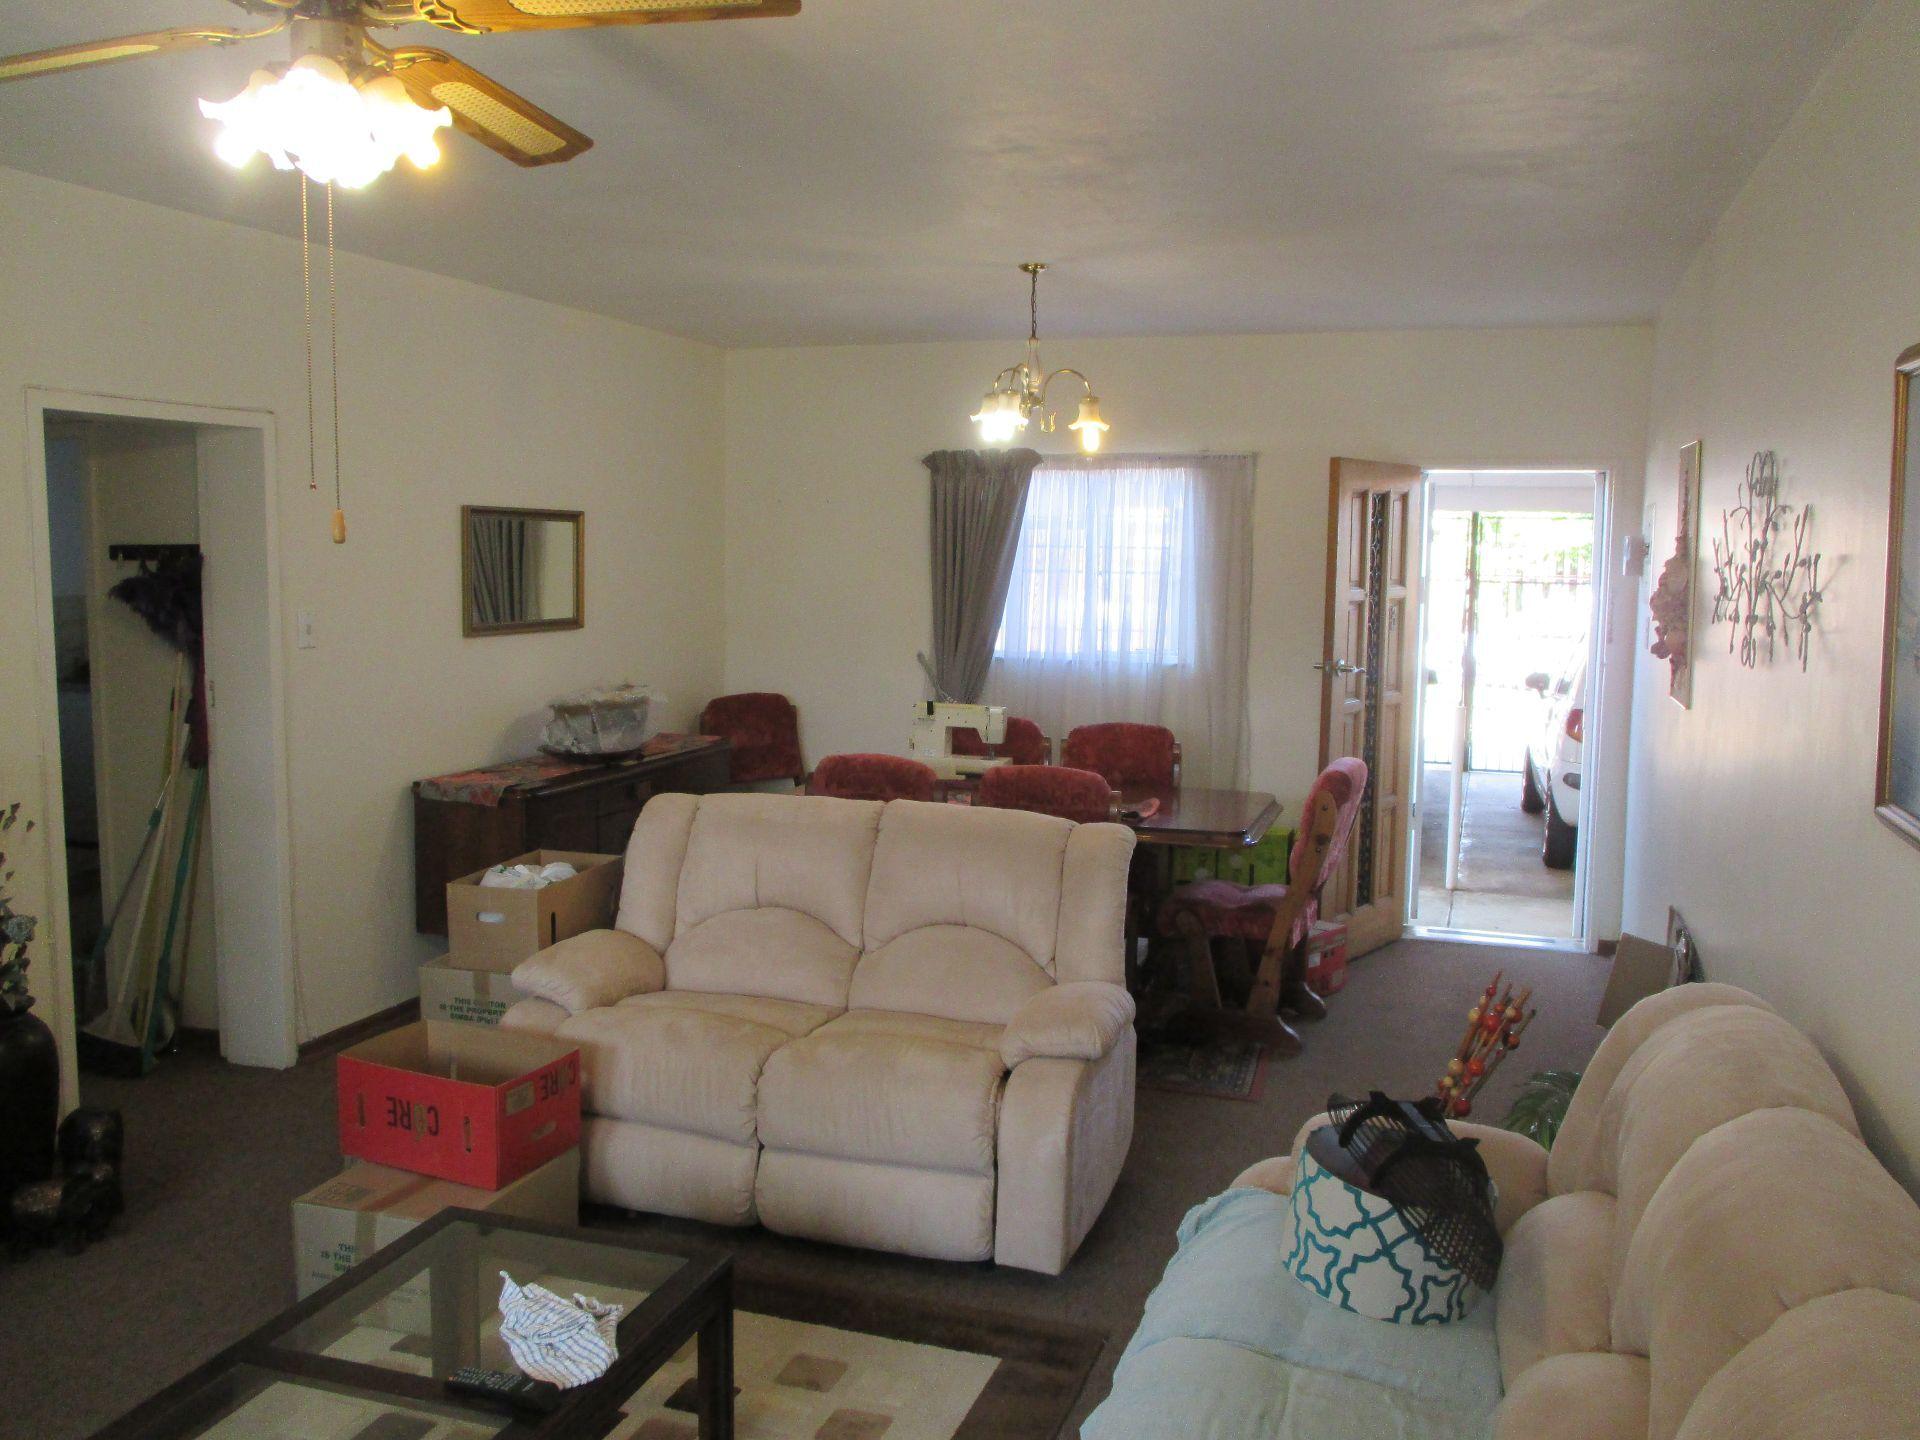 Baillie Park property for sale. Ref No: 13486345. Picture no 6